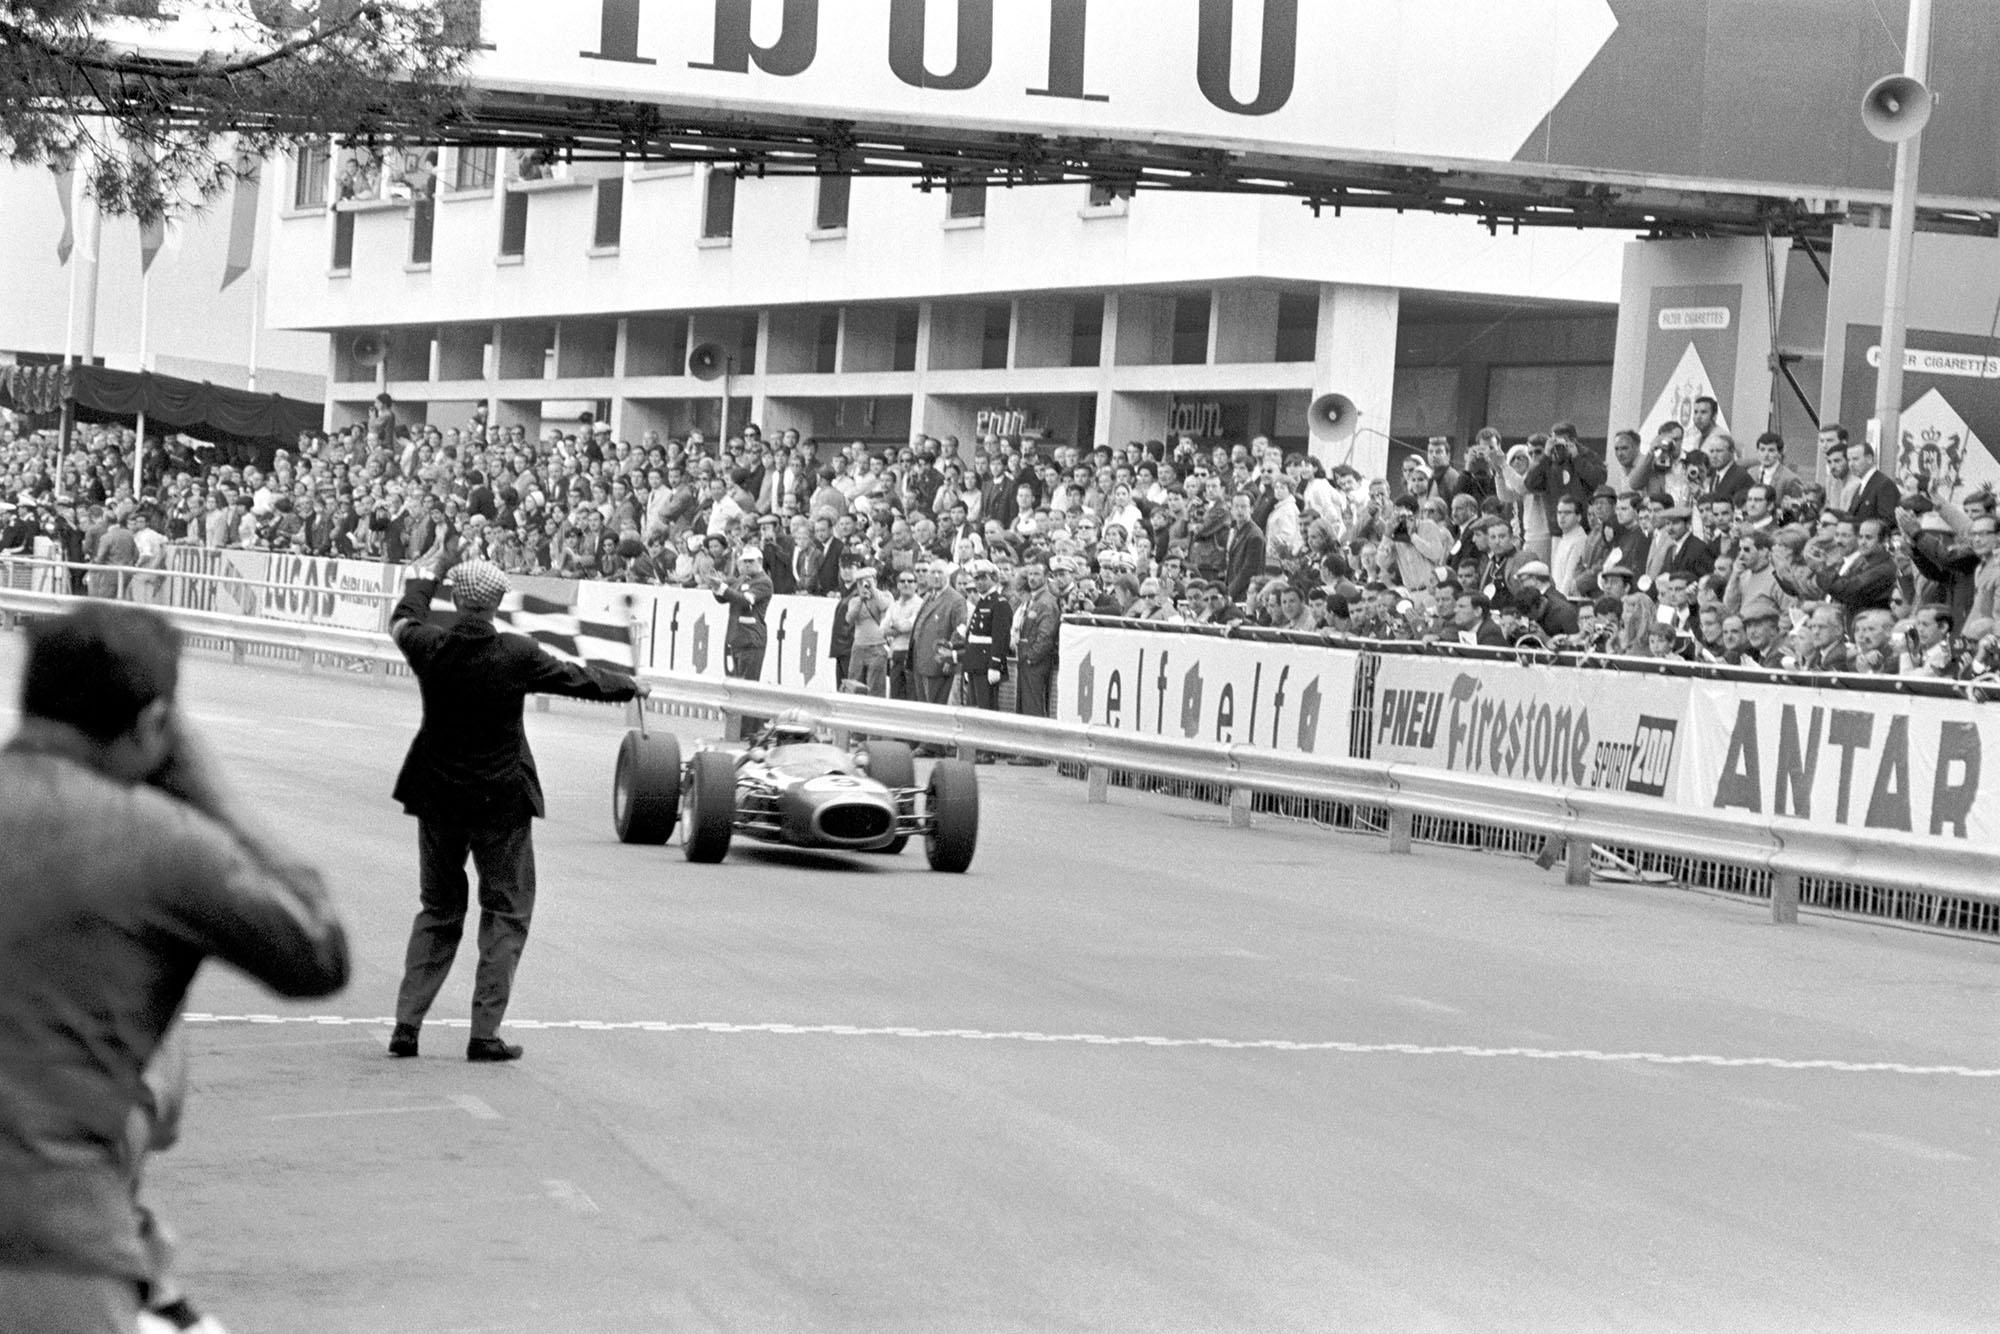 Denny Hulme (NZL) Brabham BT20 takes the chequered flag to win the Monaco Grand Prix.